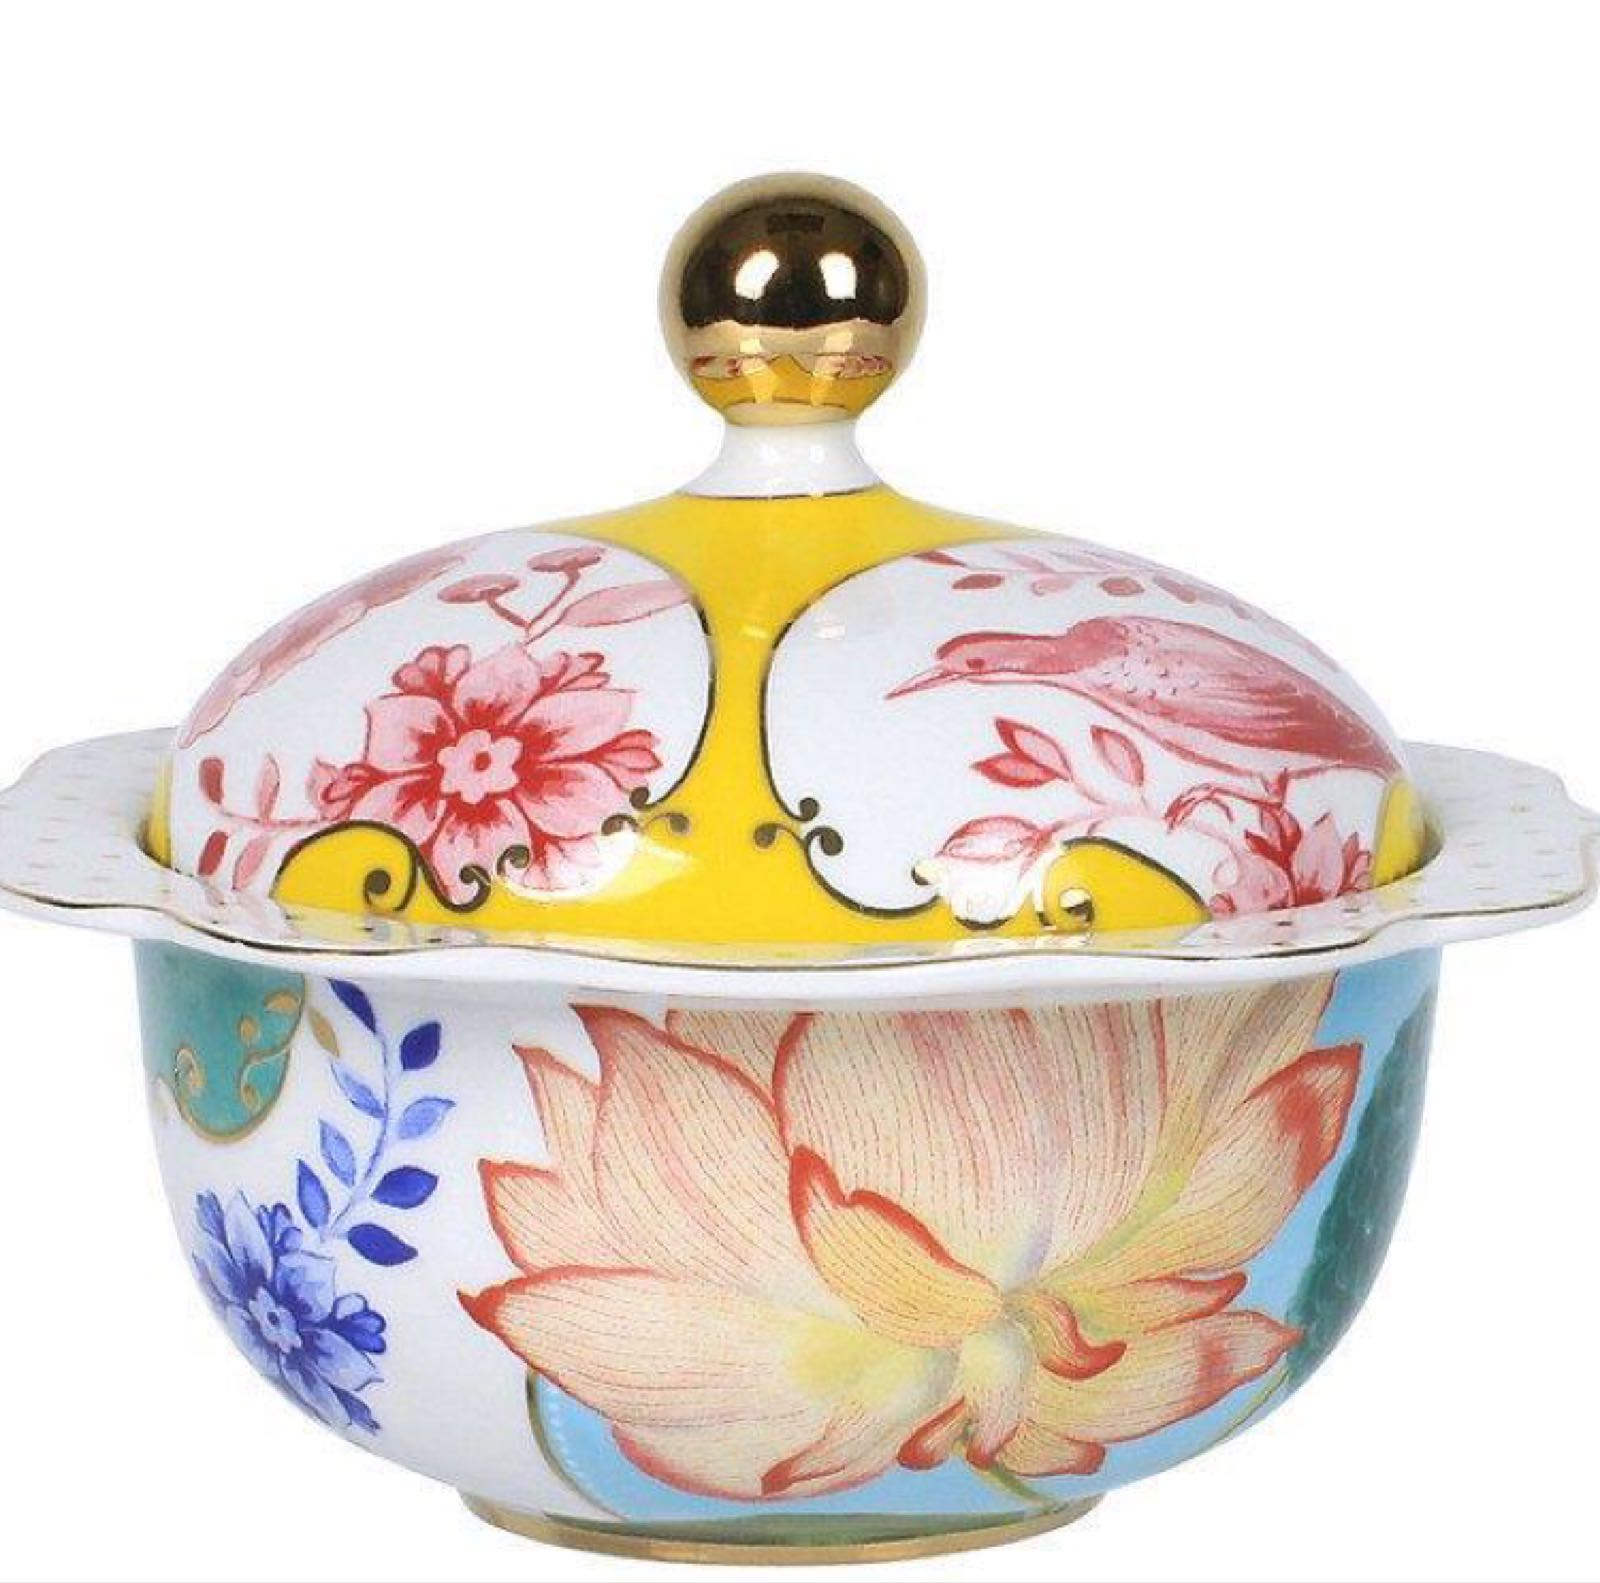 Pip studio Royal pip sugar bowl